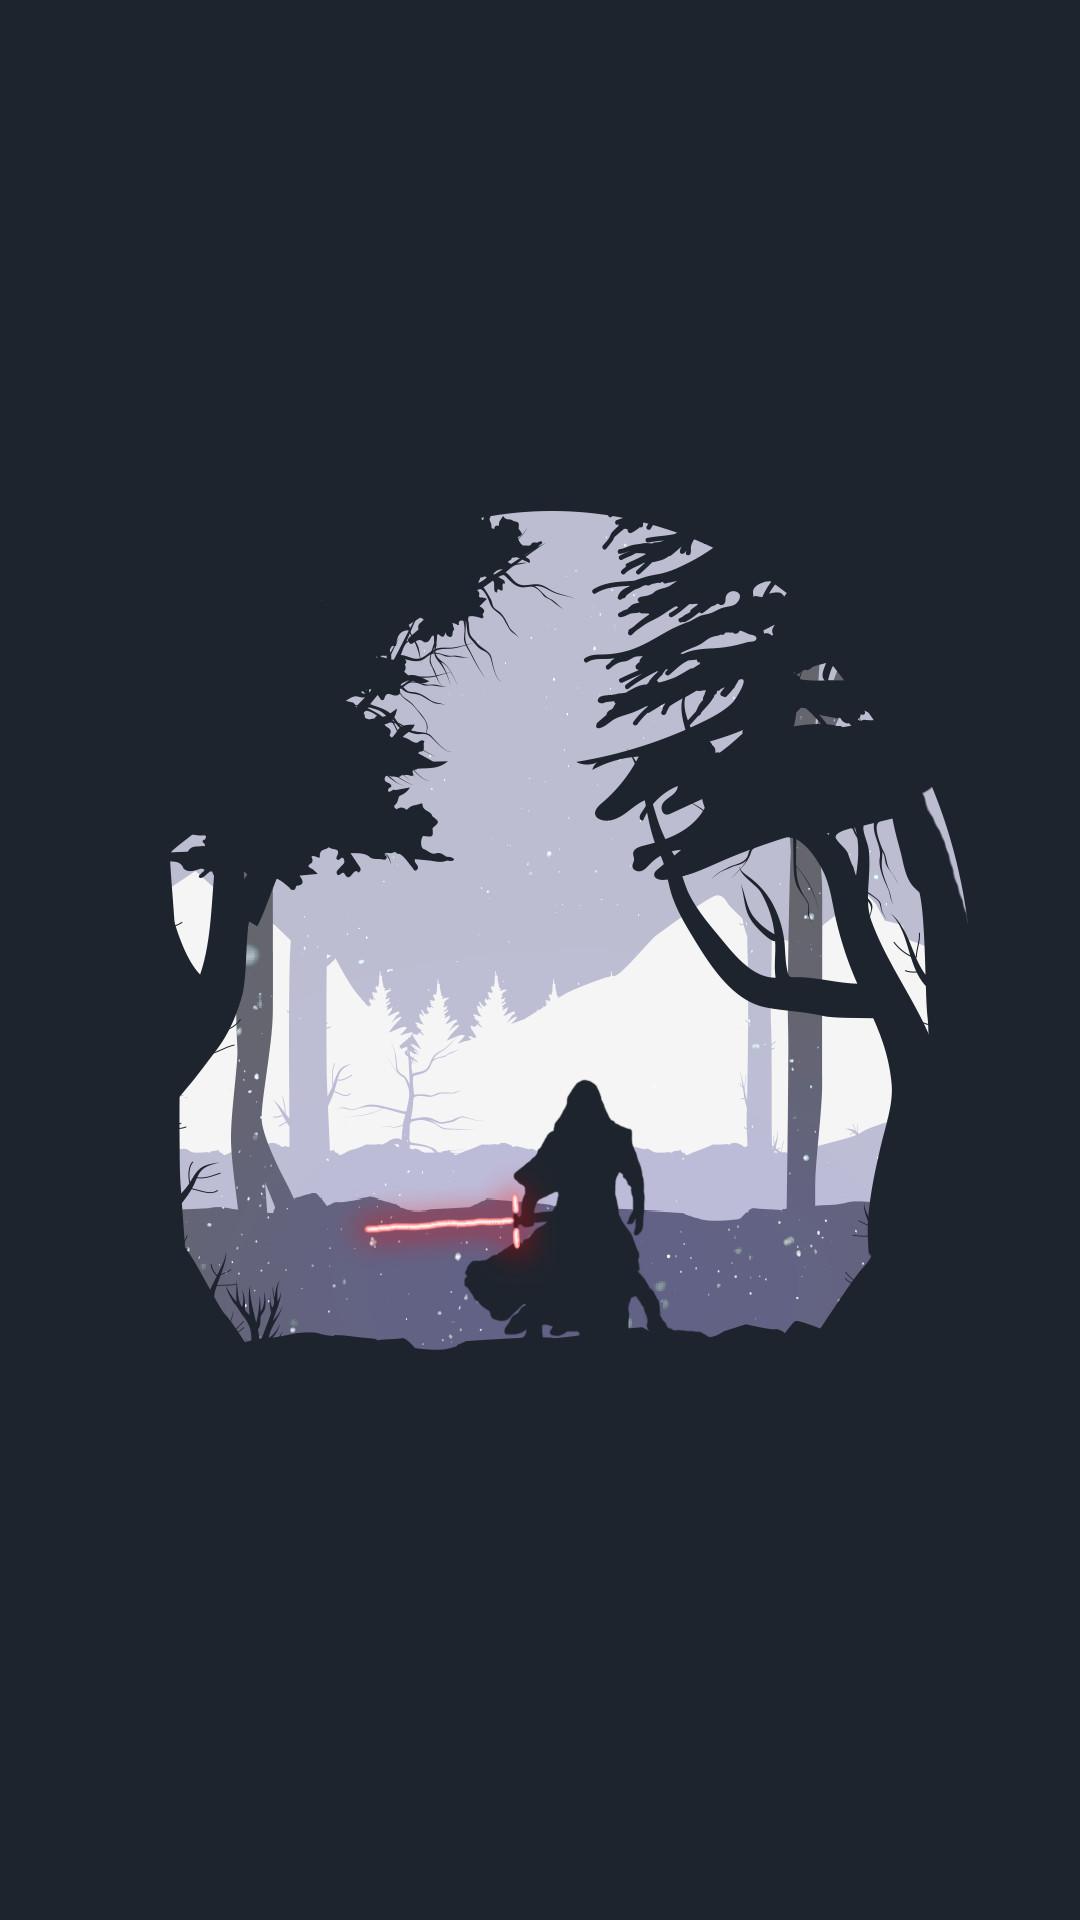 A Star Wars Christmas - Star Wars Photo (2911910) - Fanpop |Funny Star Wars Christmas Wallpaper